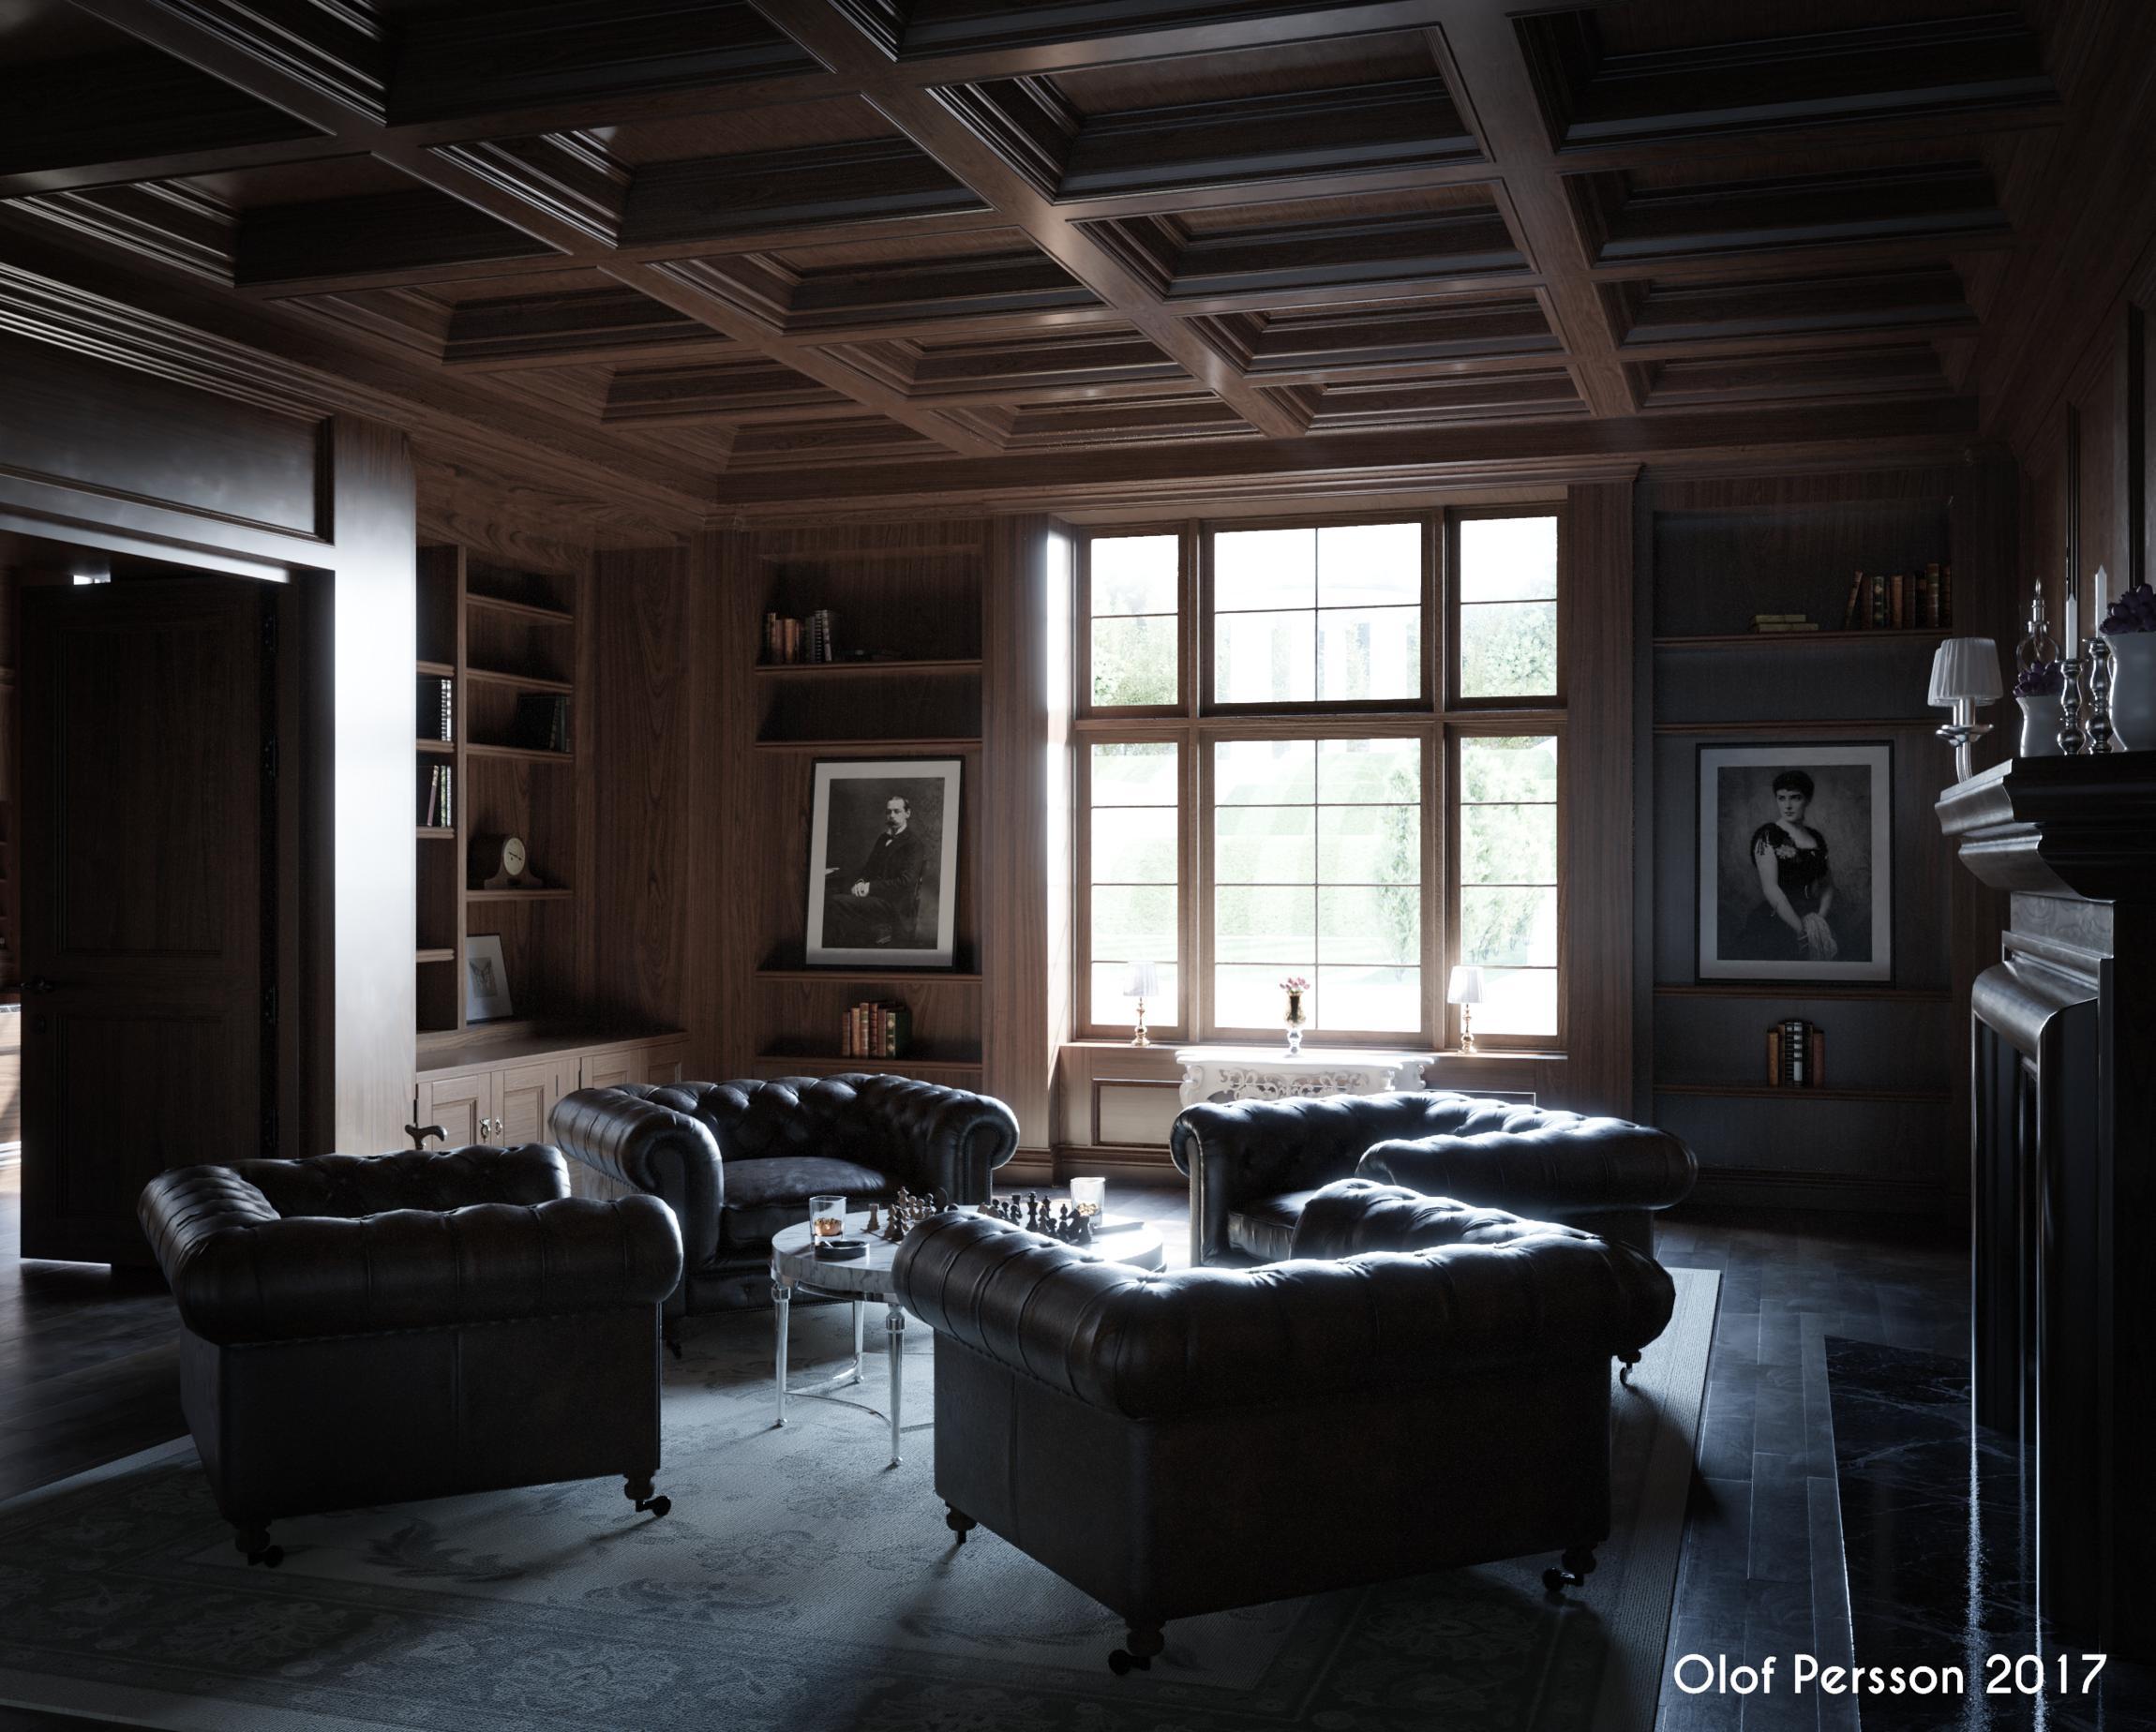 mansion_living_room - olaf persson.jpg